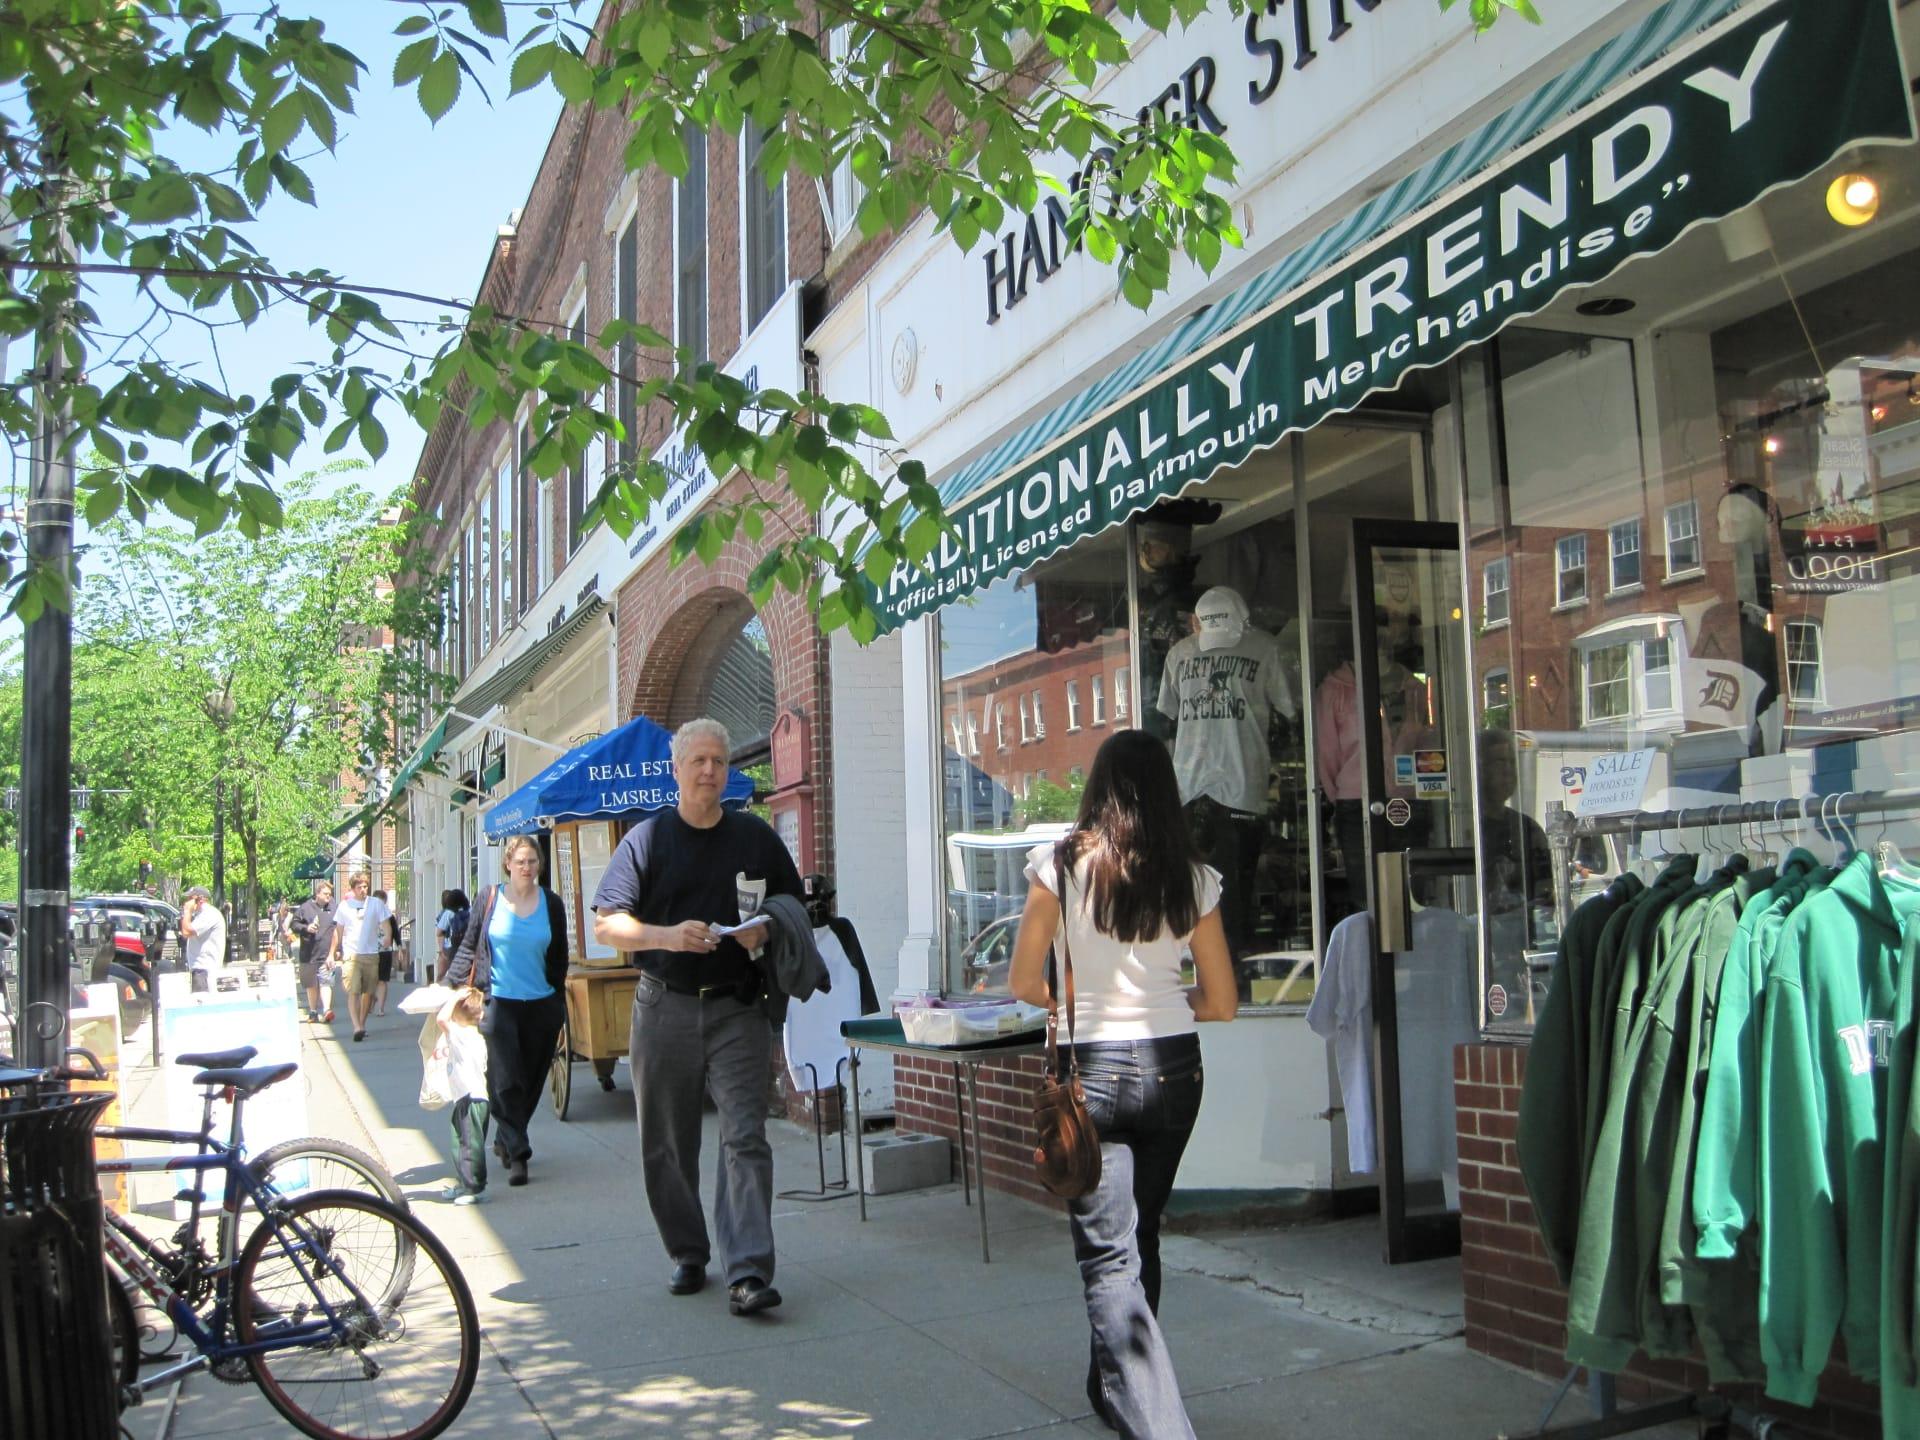 Hanover-has-a-quintessential-New-England-downtown-w1920.jpg